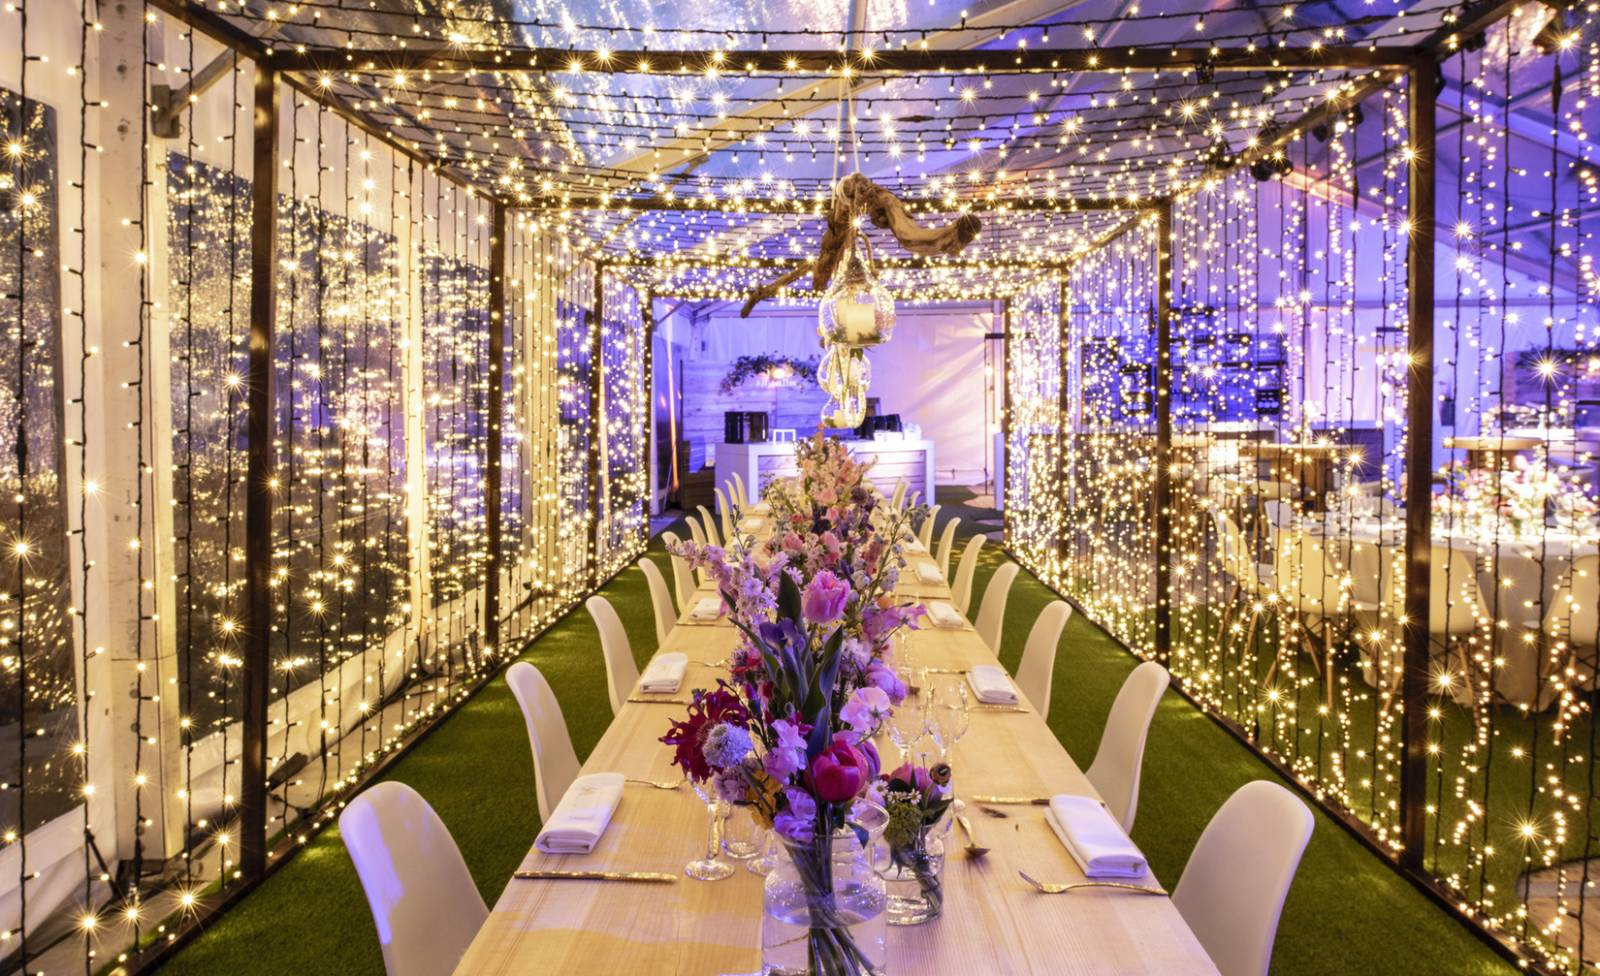 Five Nations Golf Club & Hotel - Durbuy - Feestzaal - Trouwzaal - Trouwlocatie - House of Weddingsh800-772776en2z526g